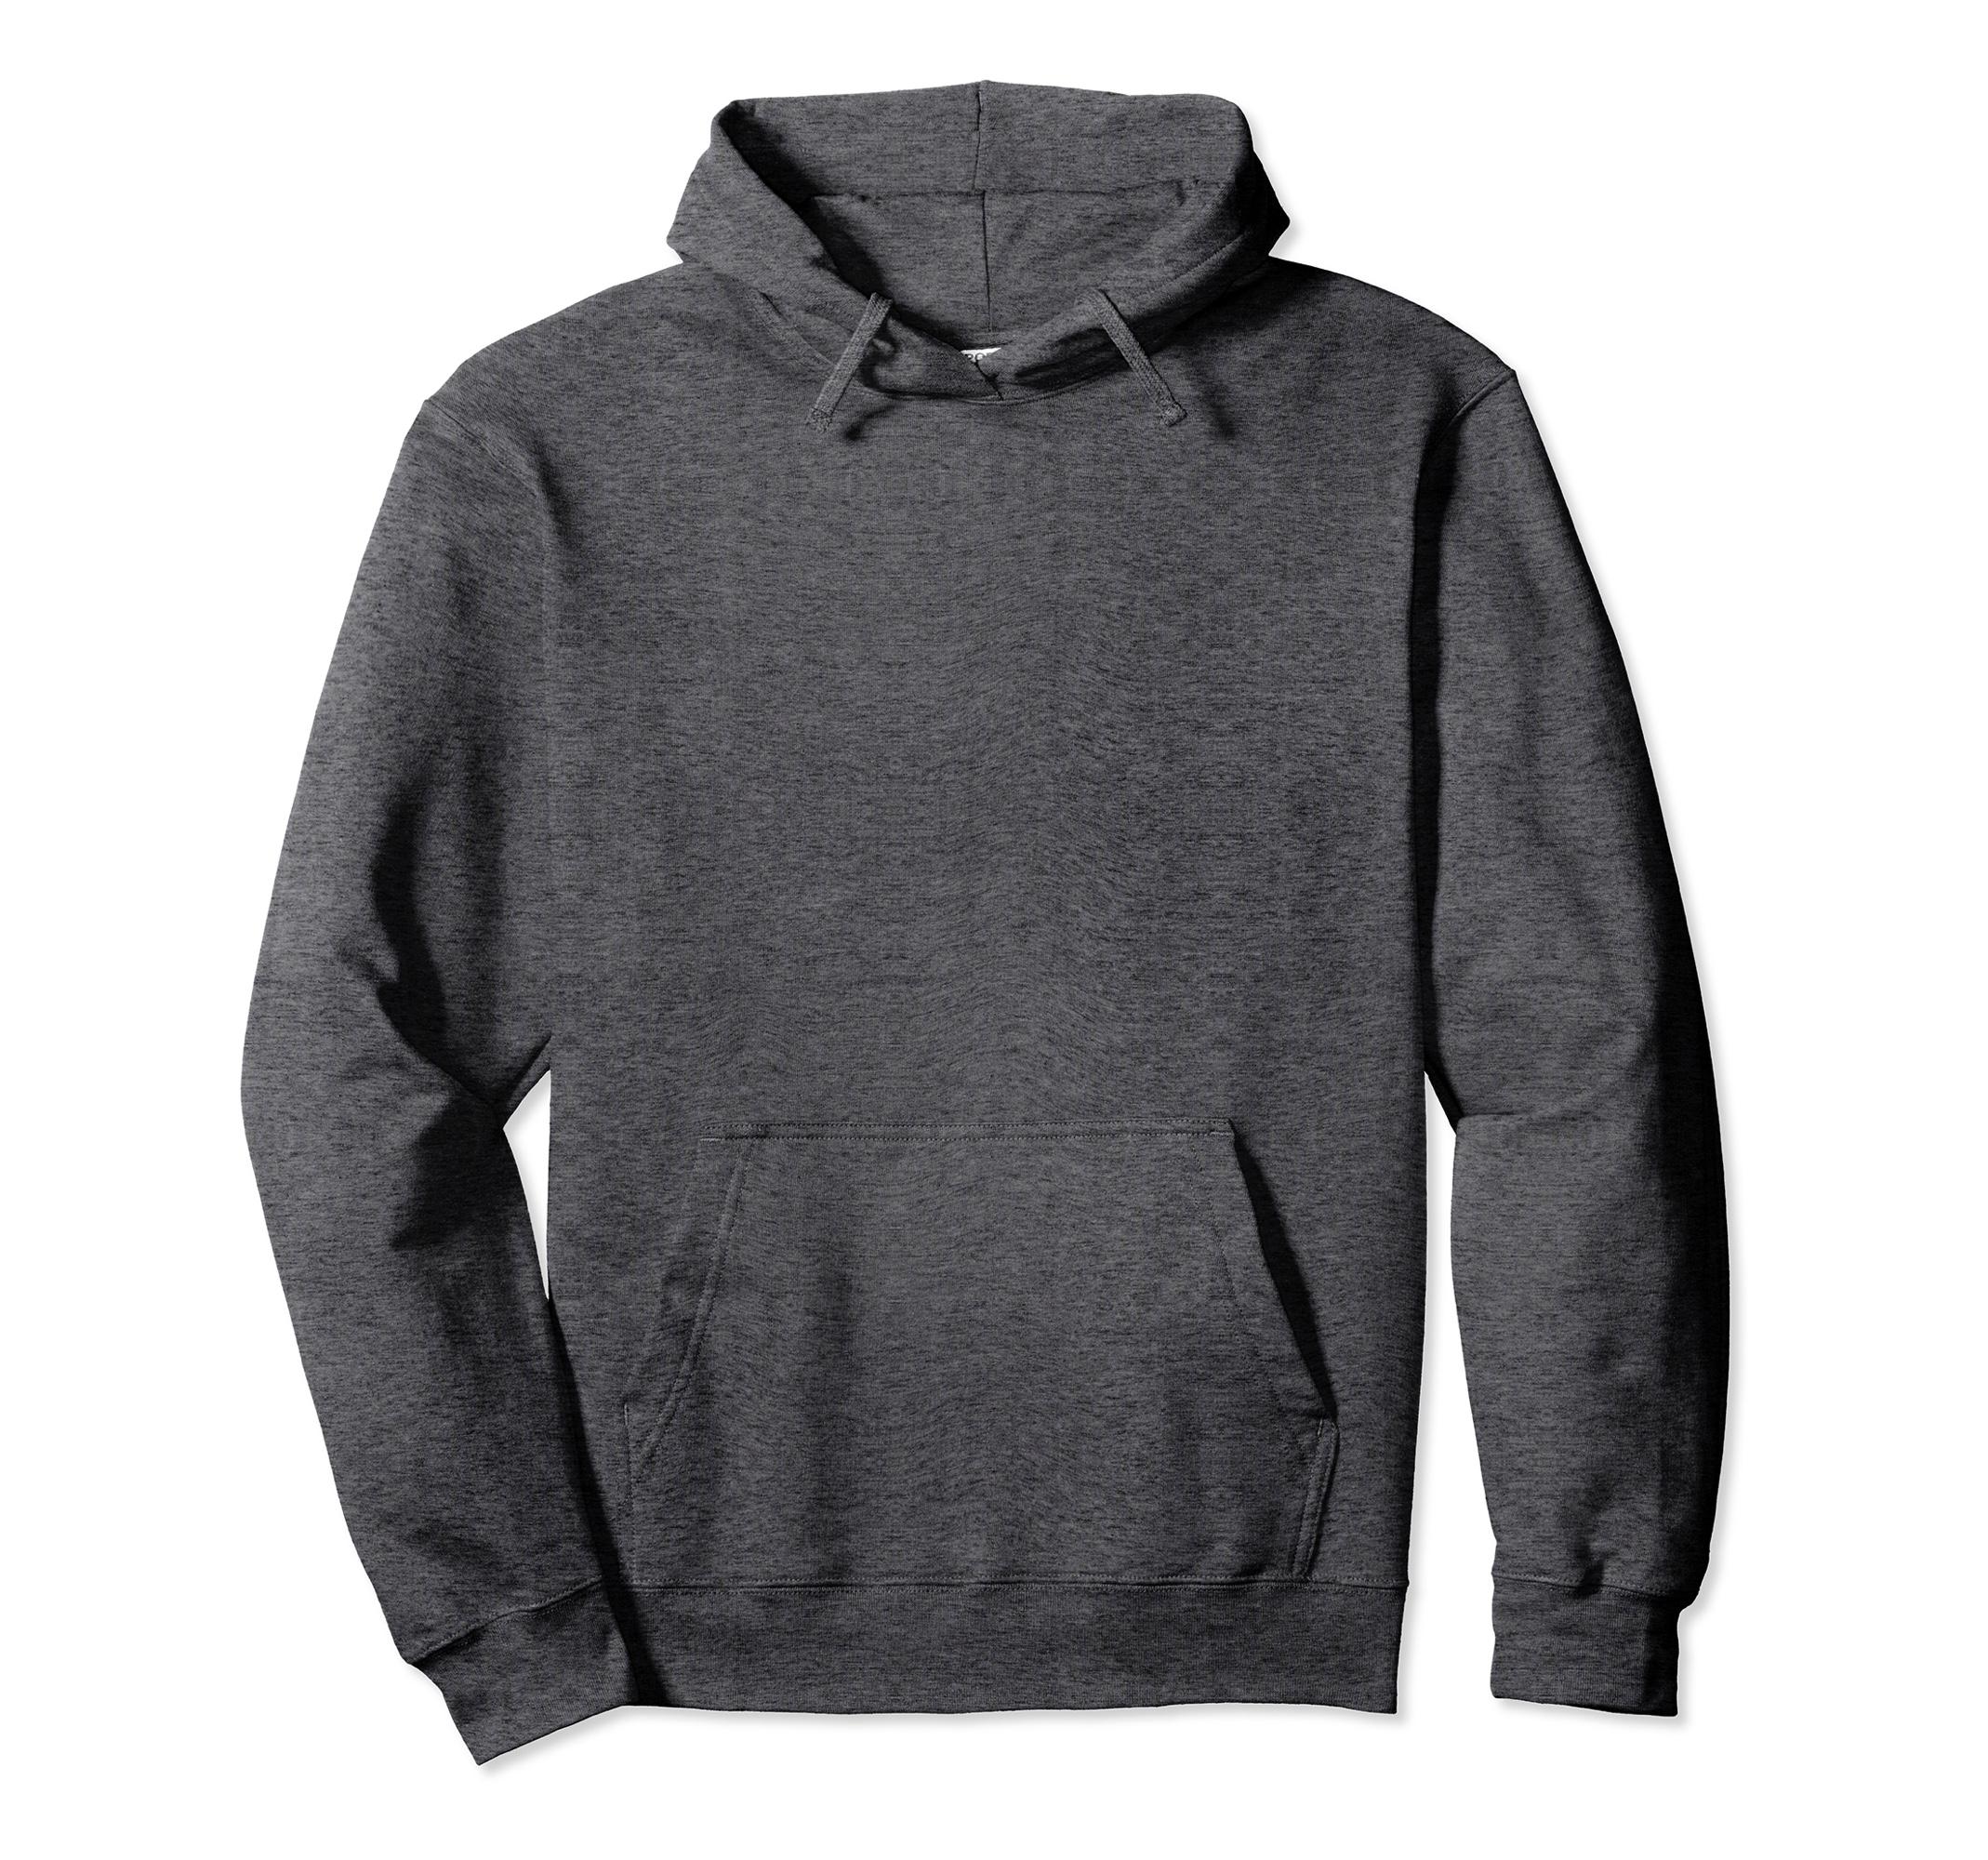 OUNAR Baseball Mom Shirt Women Football Sweatshirt Graphic Pullover Blouse